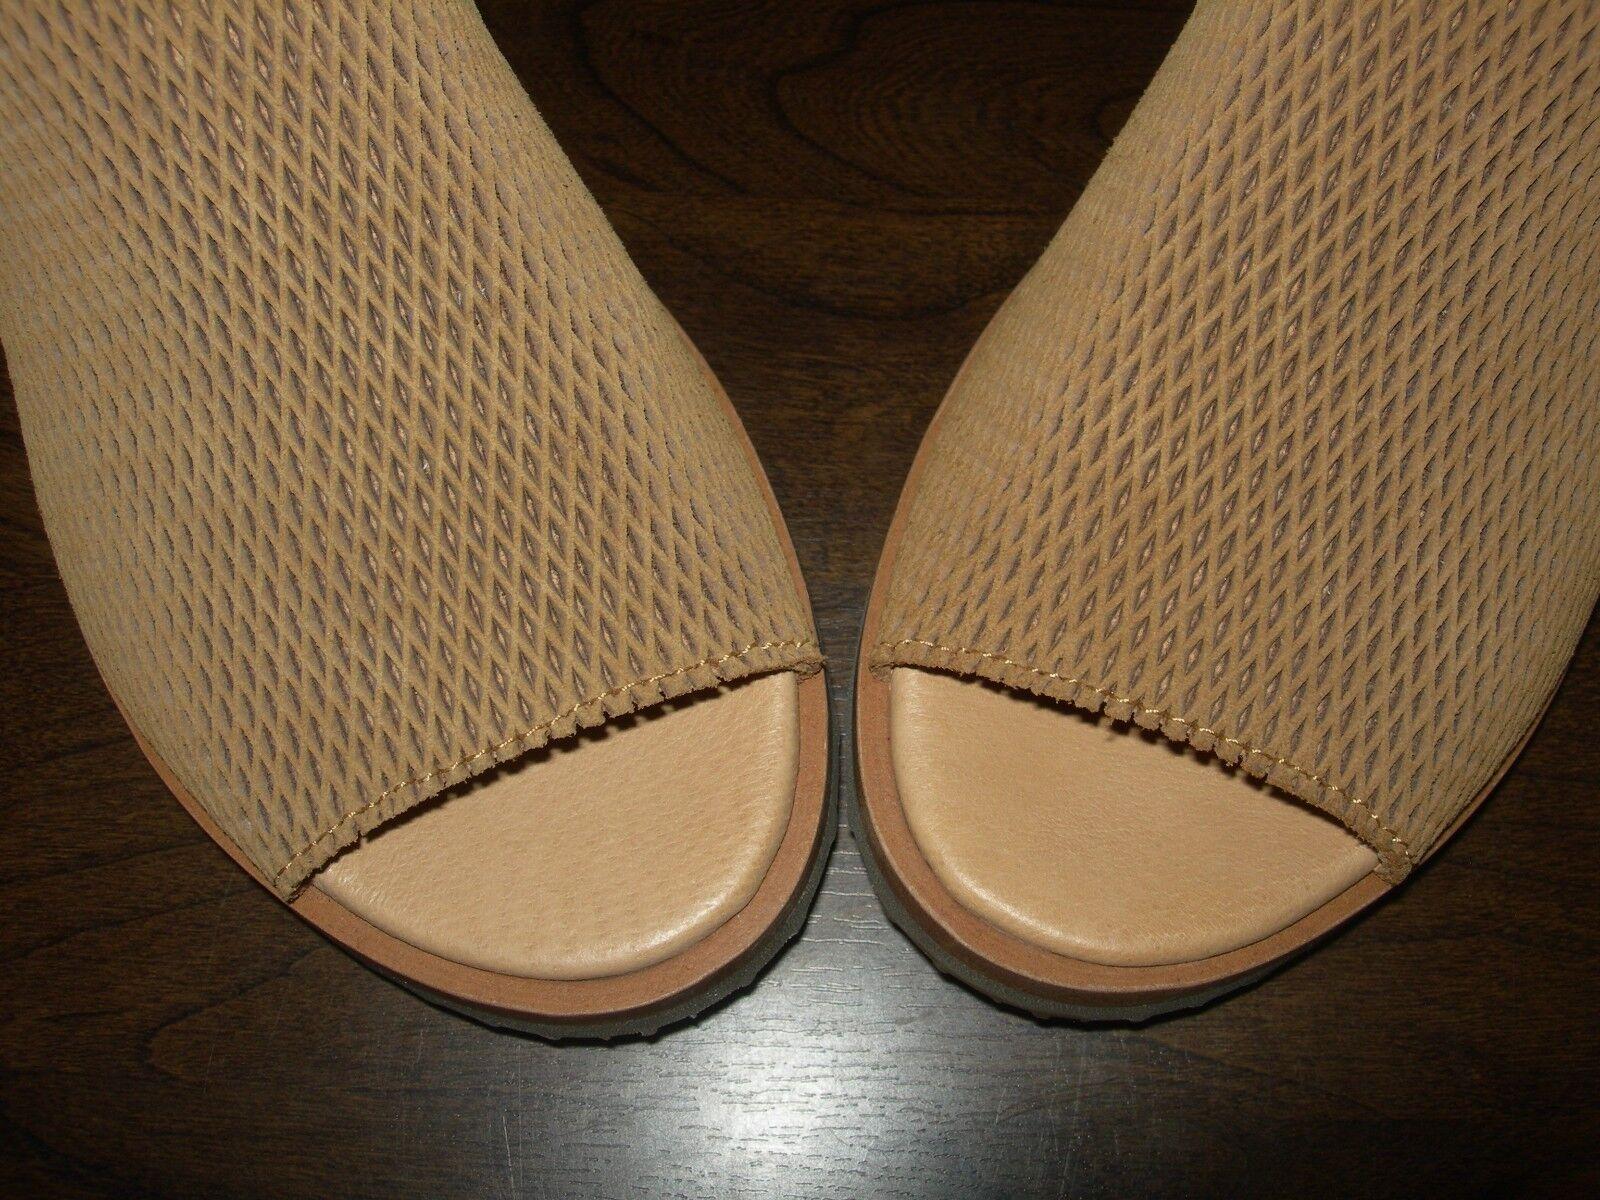 EL NATURALISTA WOMEN'S Schuhe SANDALS OPEN TOES EU 100% LEATHER EU TOES 39 / UK 6 SLIM 567c4c